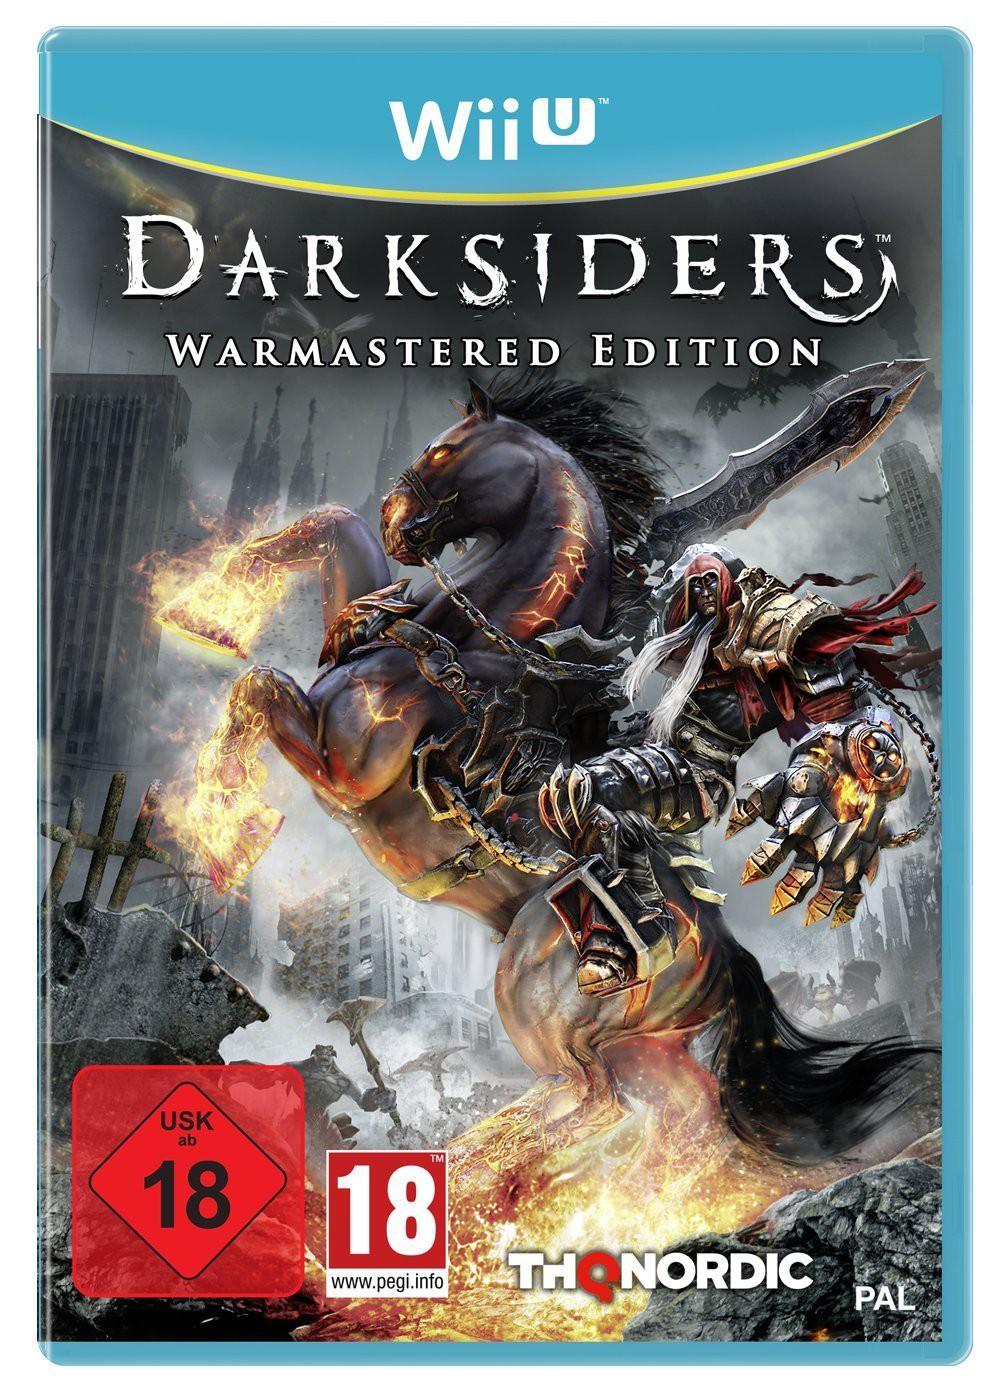 Darksiders: Warmastered Edition (Wii U, multilingual, Metacritic 77/7.9)